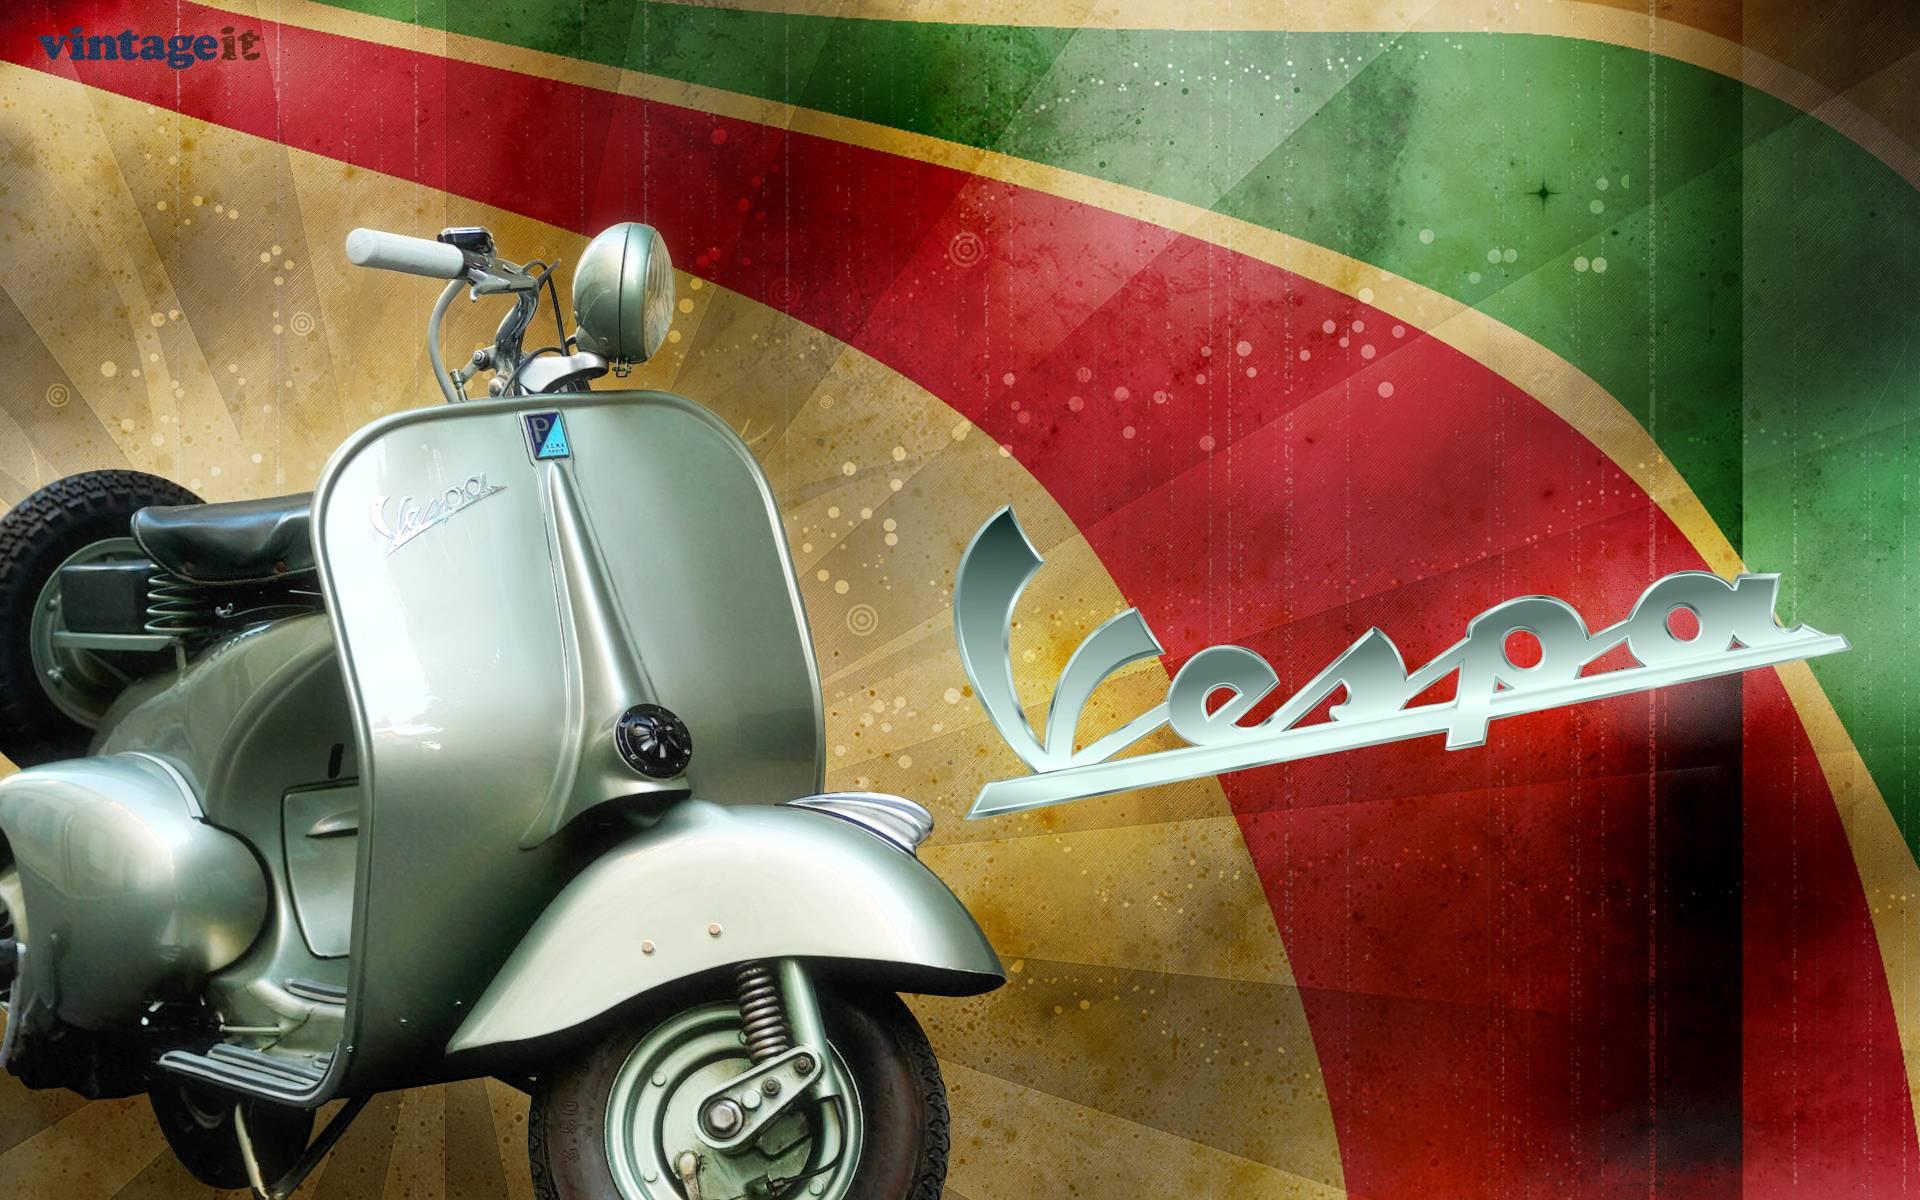 Vespa Wallpapers - Full HD wallpaper search